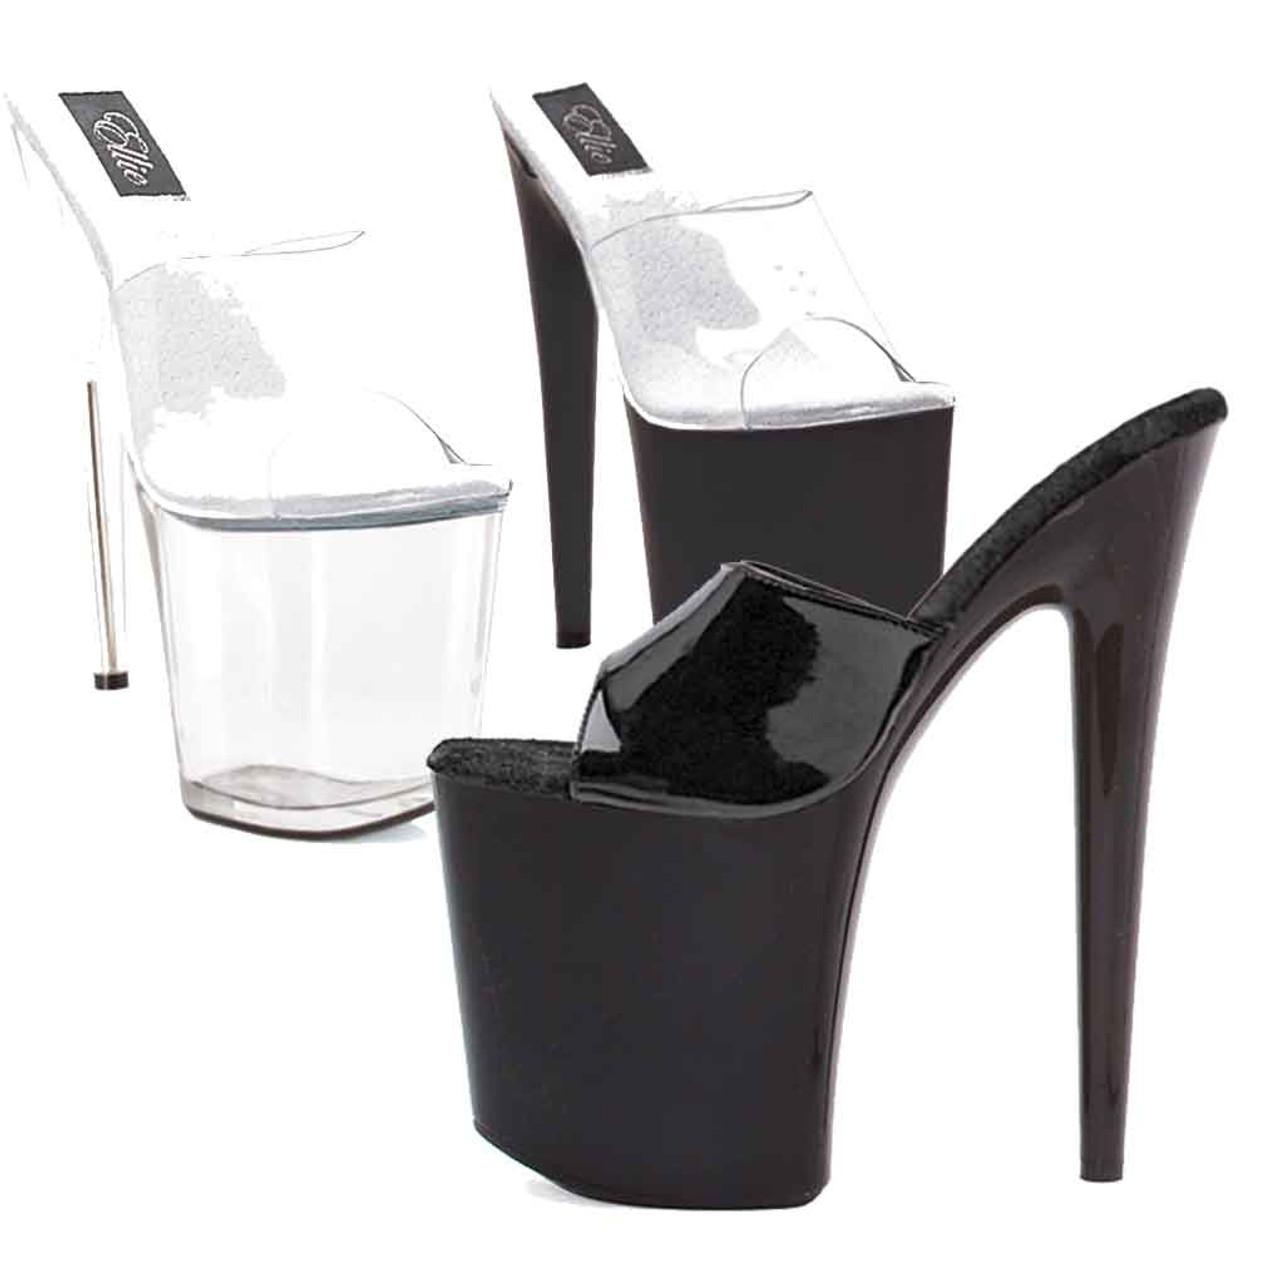 850-VANITY, 8 Inch Stiletto High Heel